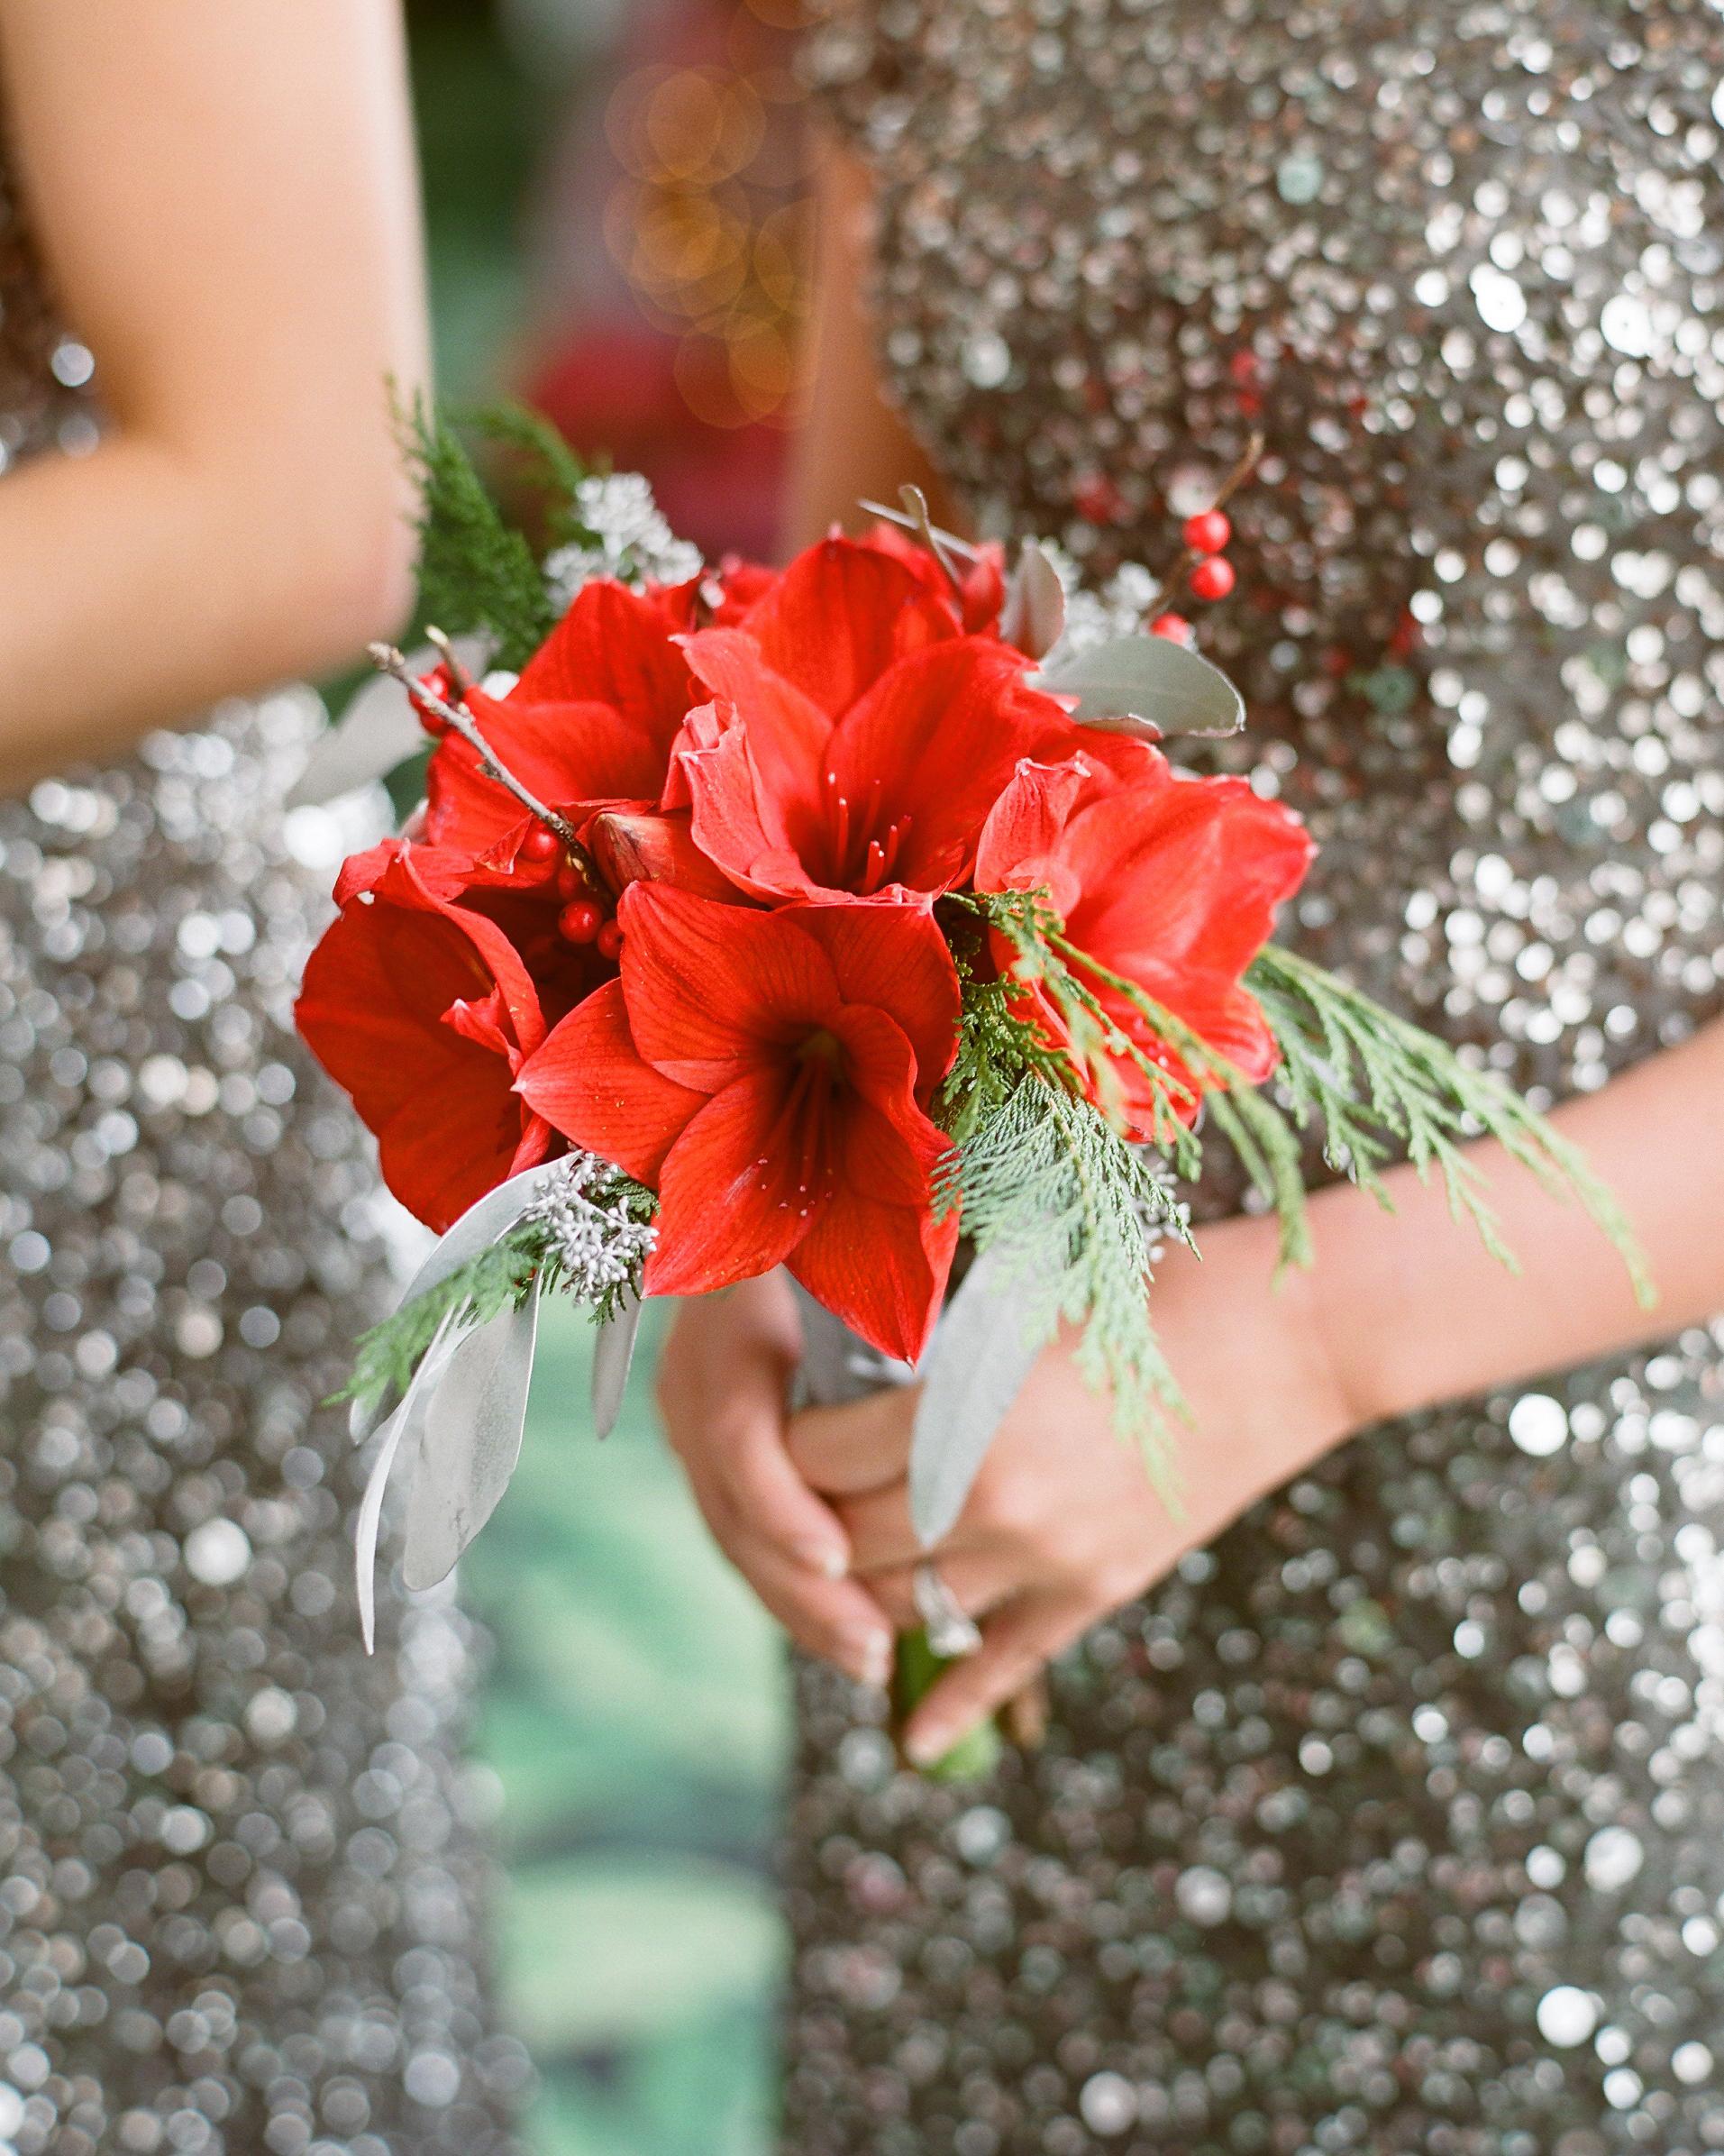 paige-michael-wedding-bouquet-0492-s112431-1215.jpg